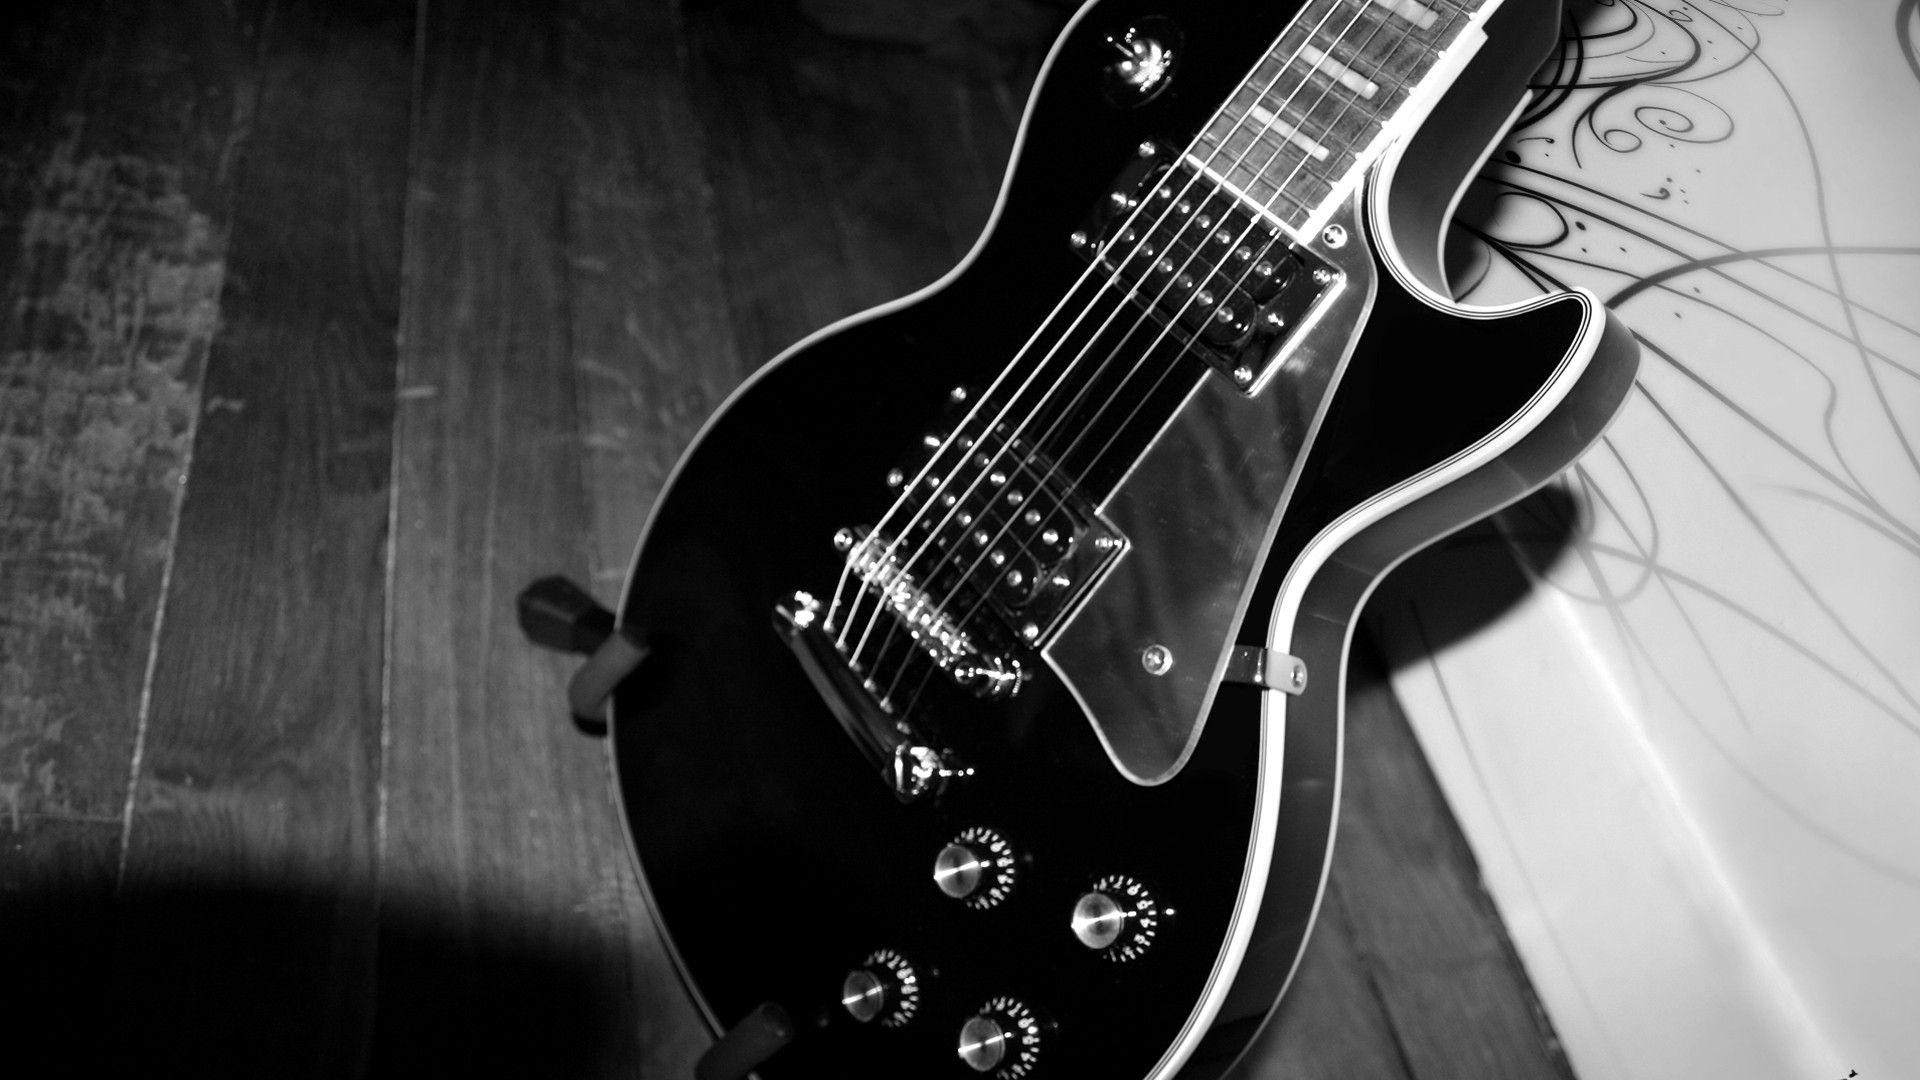 Electric Guitar black, New Wallpaper